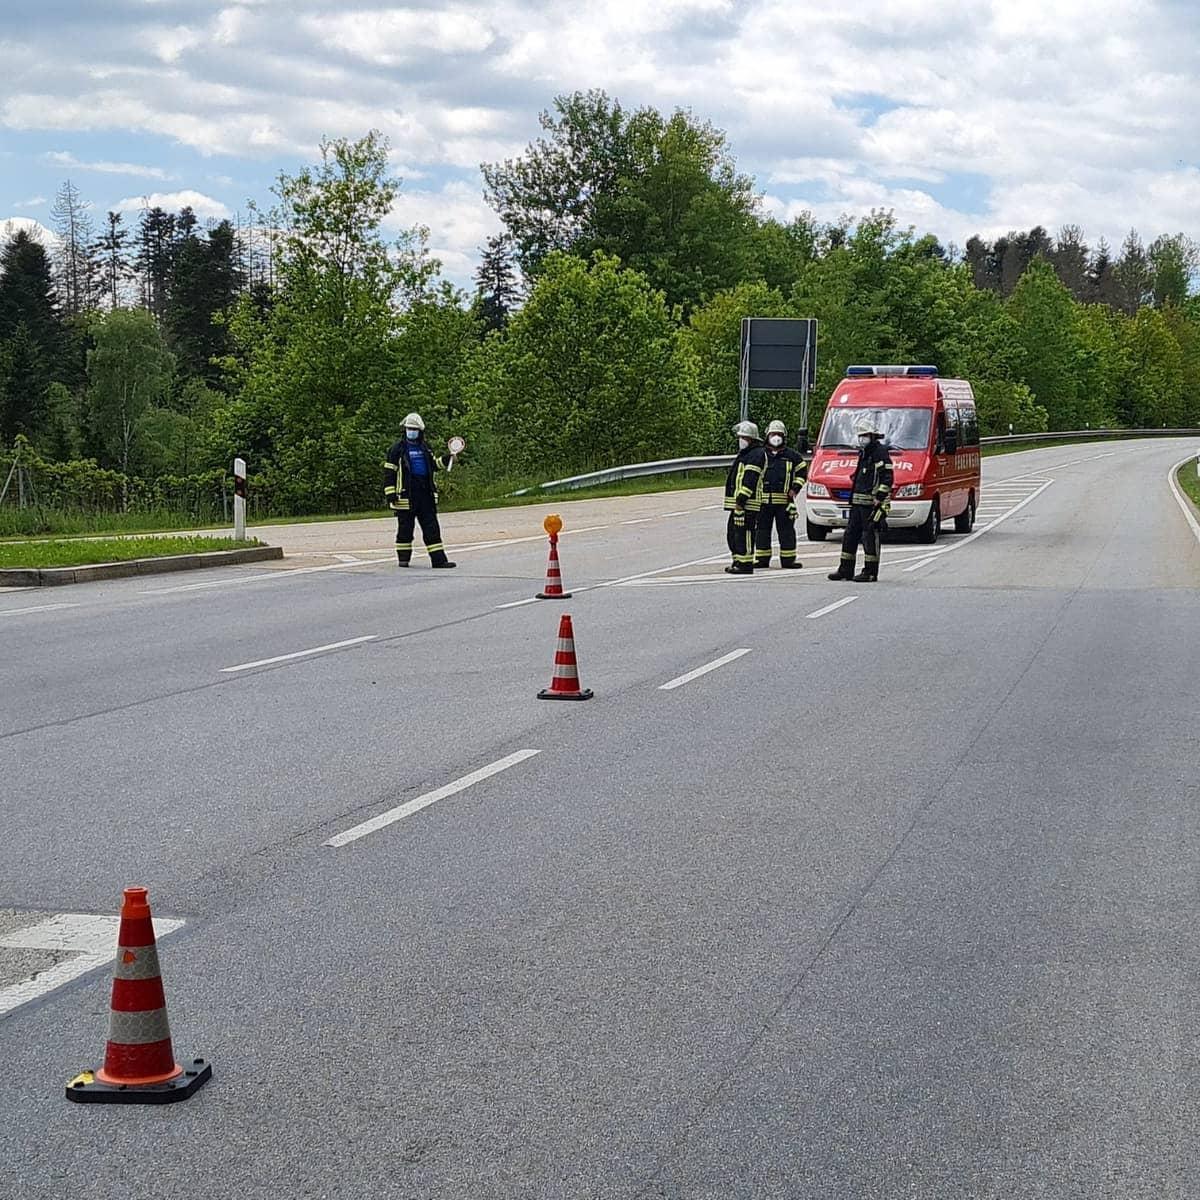 Verkehrsunfall Autobahnzubringer, Höhe Firma Bayerwald30.05.2021